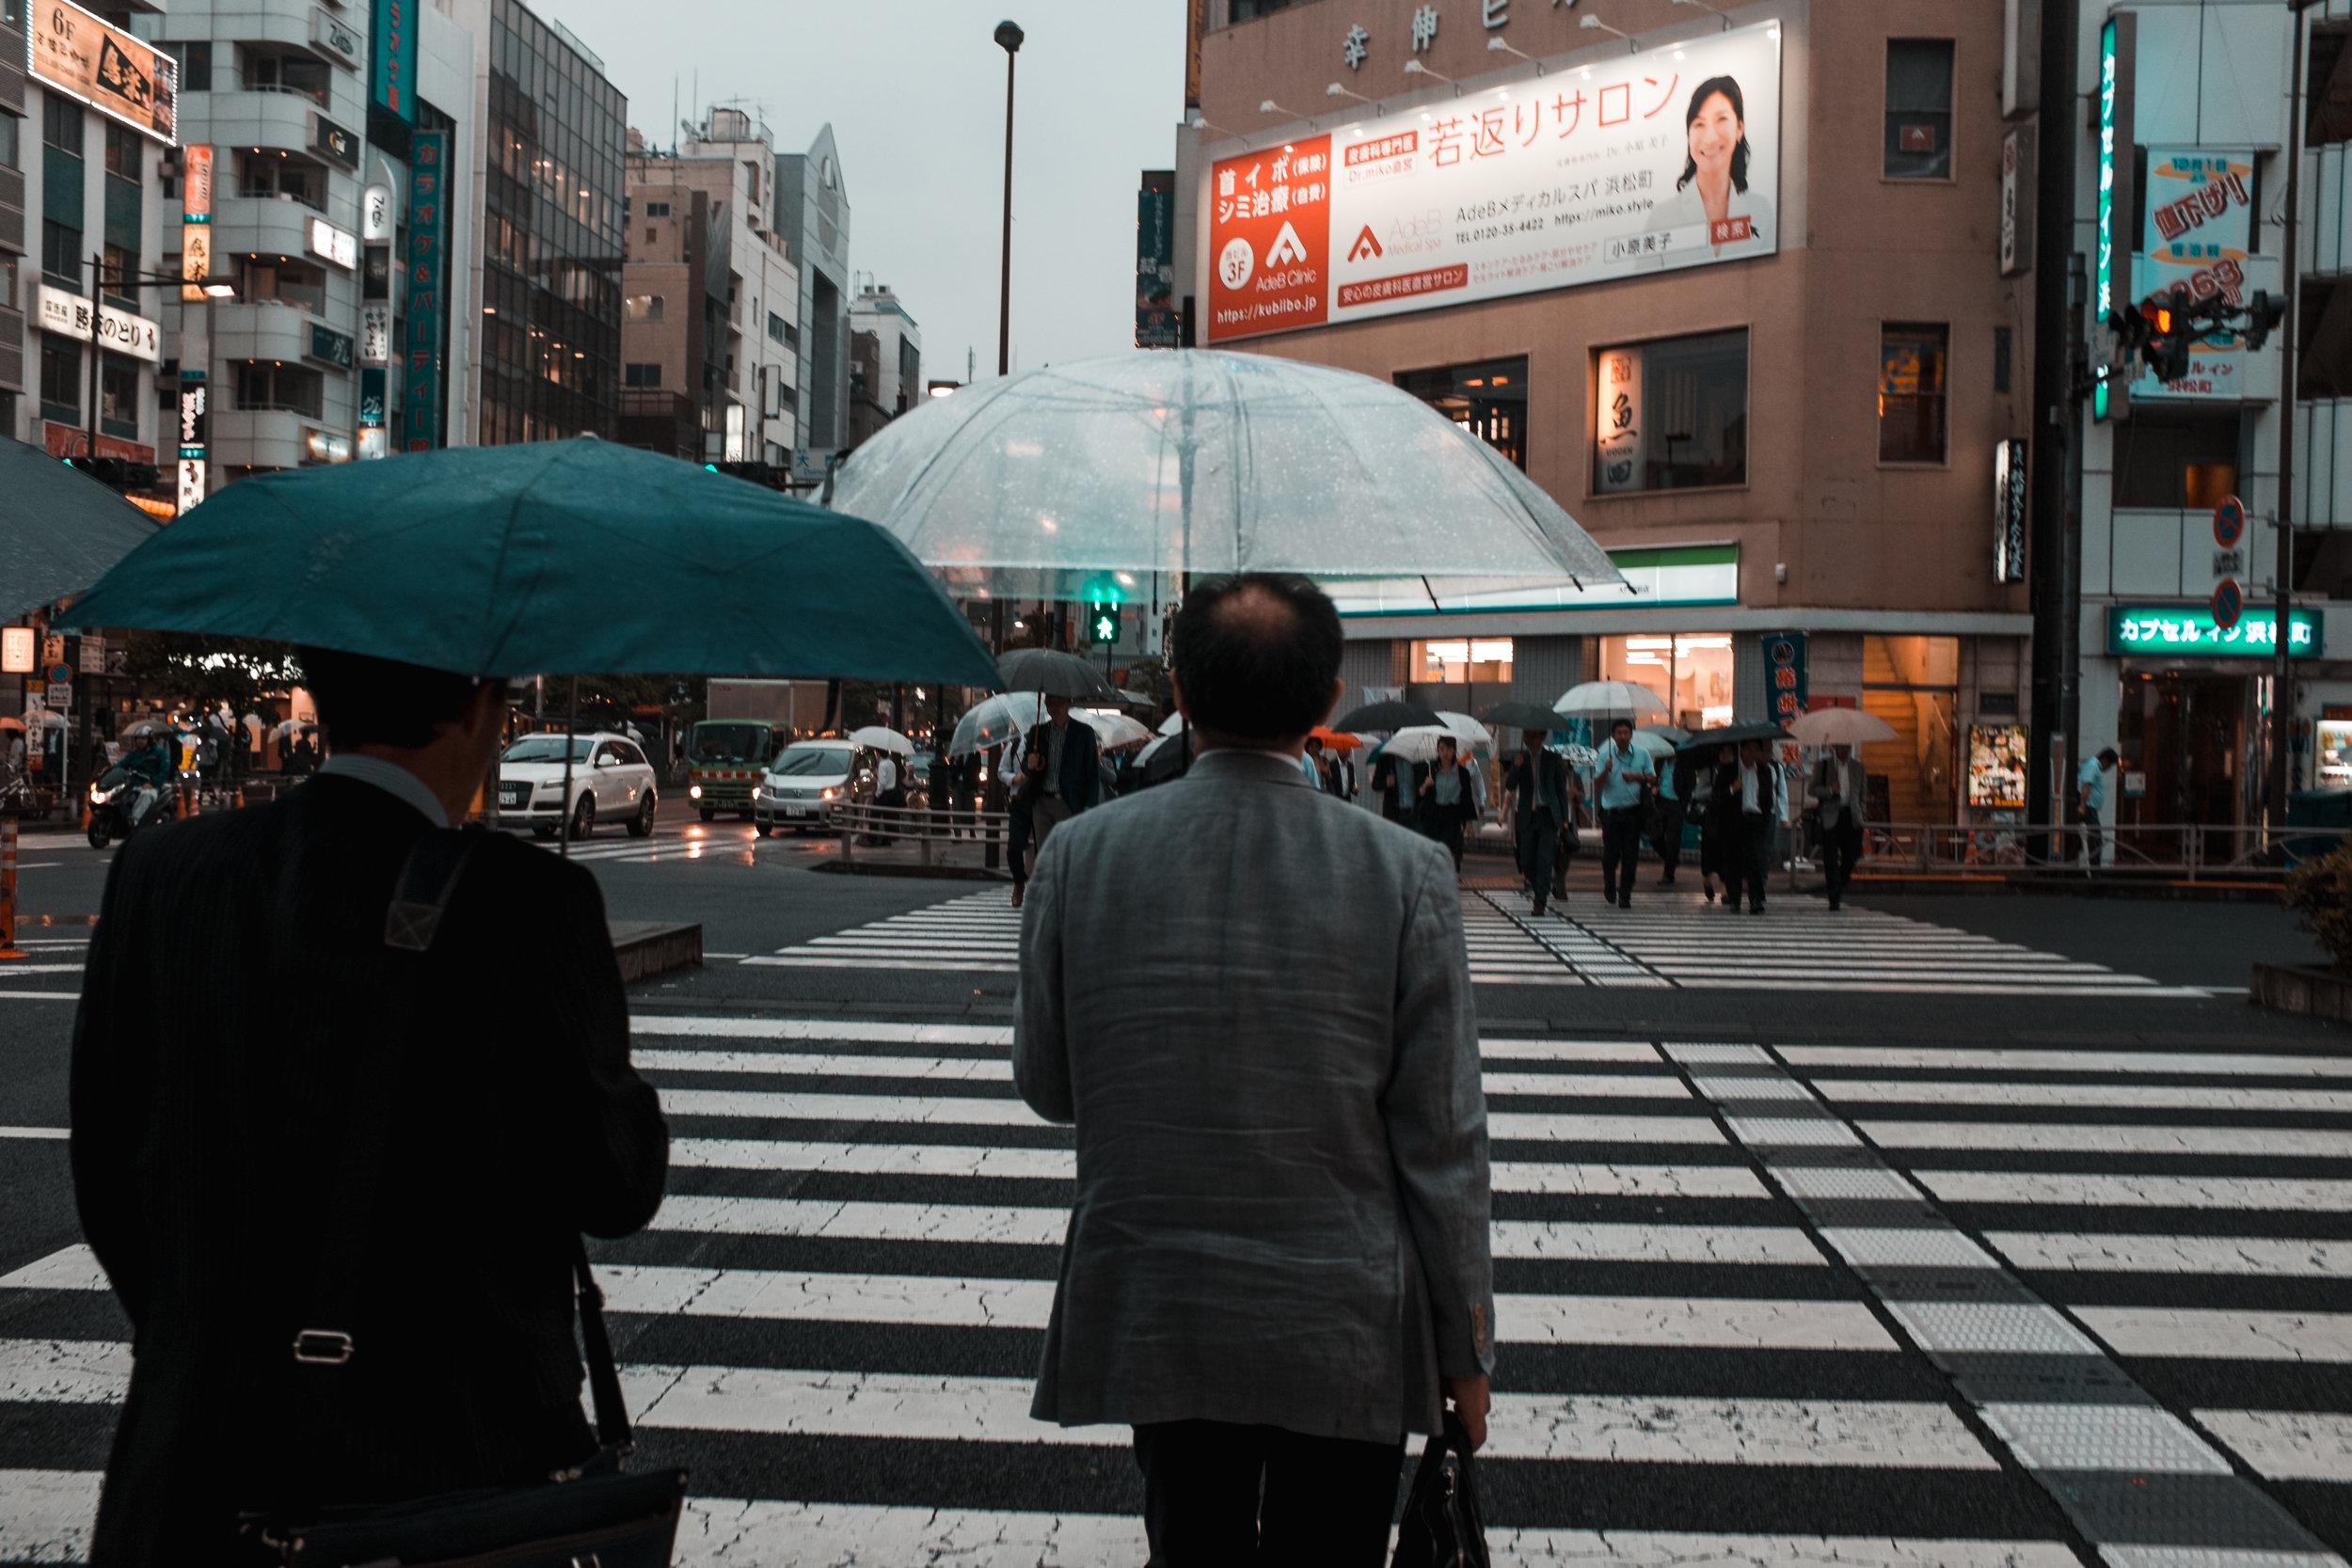 TokyoJapan_2018_AdamDillon_DSCF9037.jpg